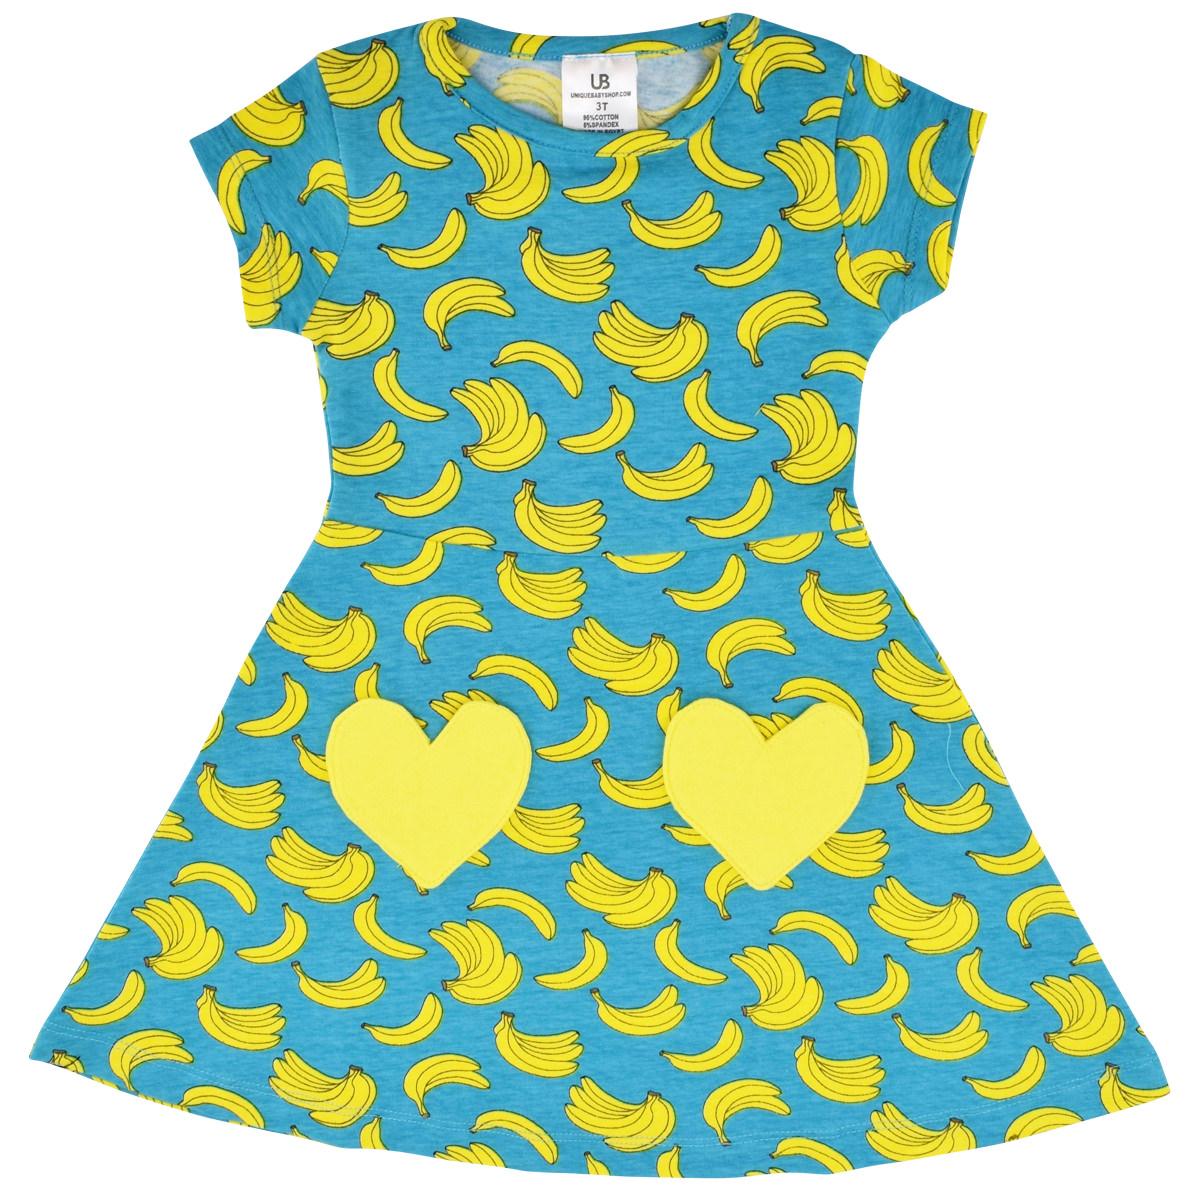 27913d598 Unique Baby Girls Spring Summer Banana Dress Boutique Toddler Kids ...